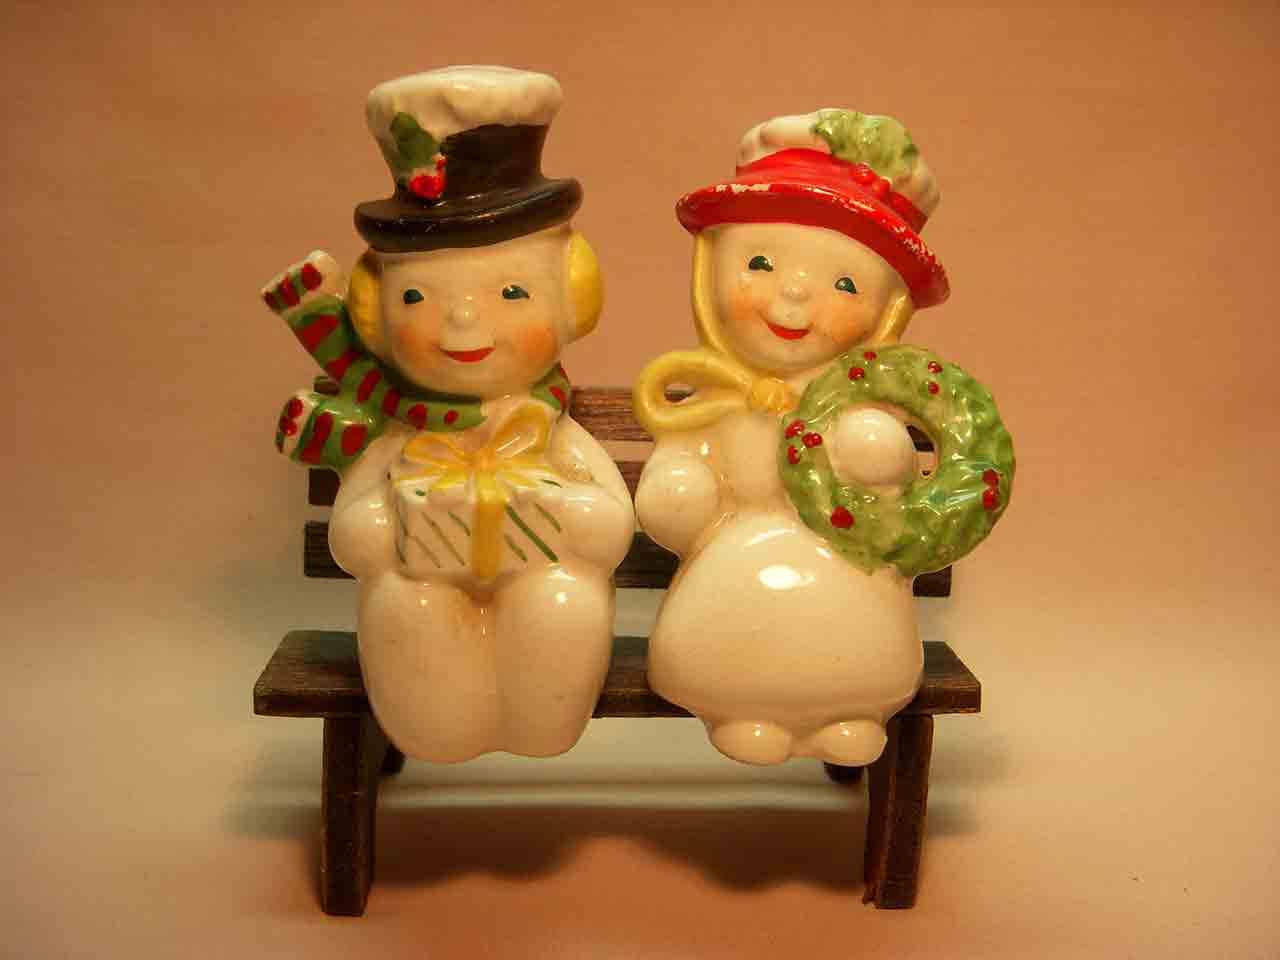 Christmas snowmen couple bench sitters salt and pepper shaker